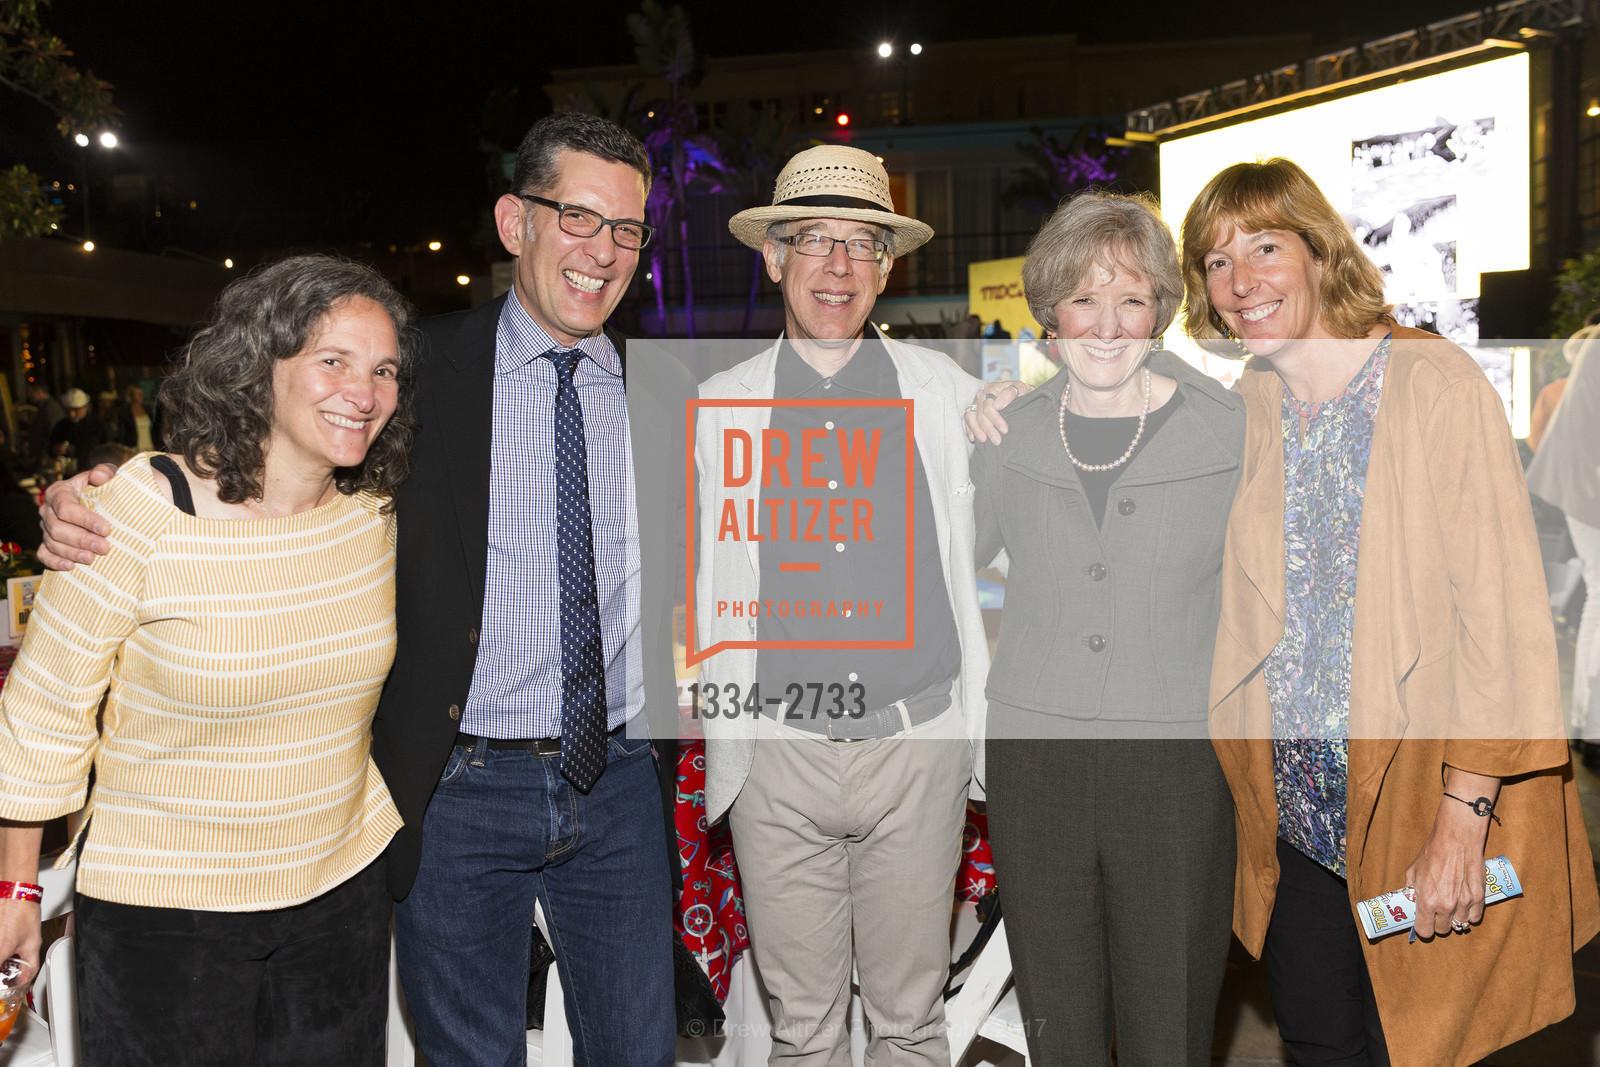 Liz Orlin, Doug Gary, Don Falk, Kathy Lowry, Carolyn Adams, Photo #1334-2733